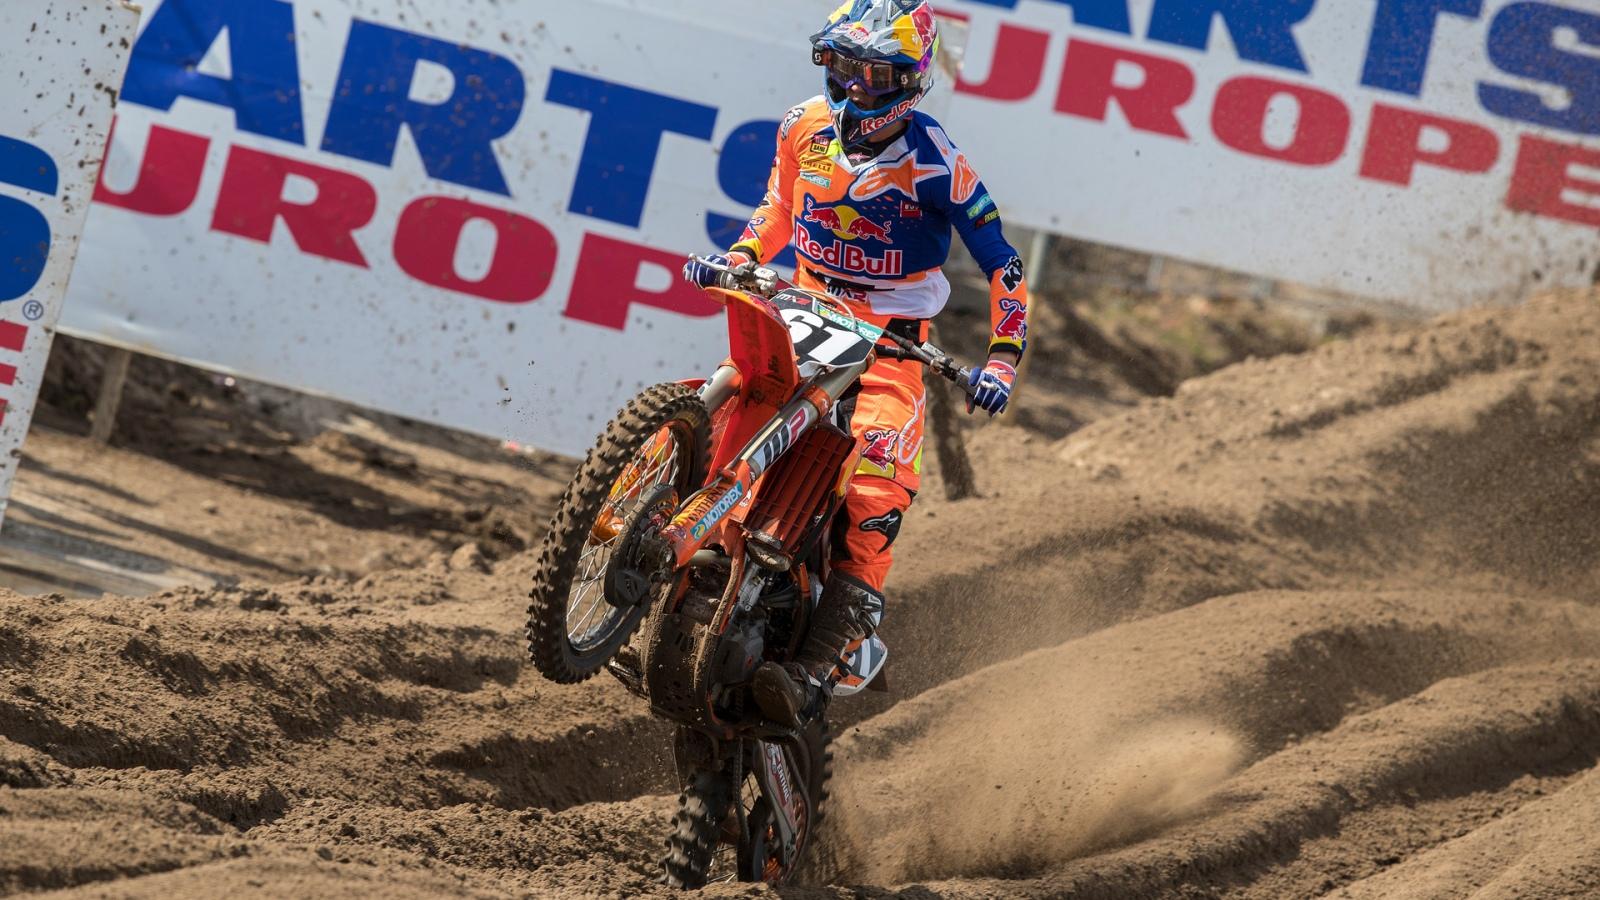 Las 20 victorias de Jorge Prado